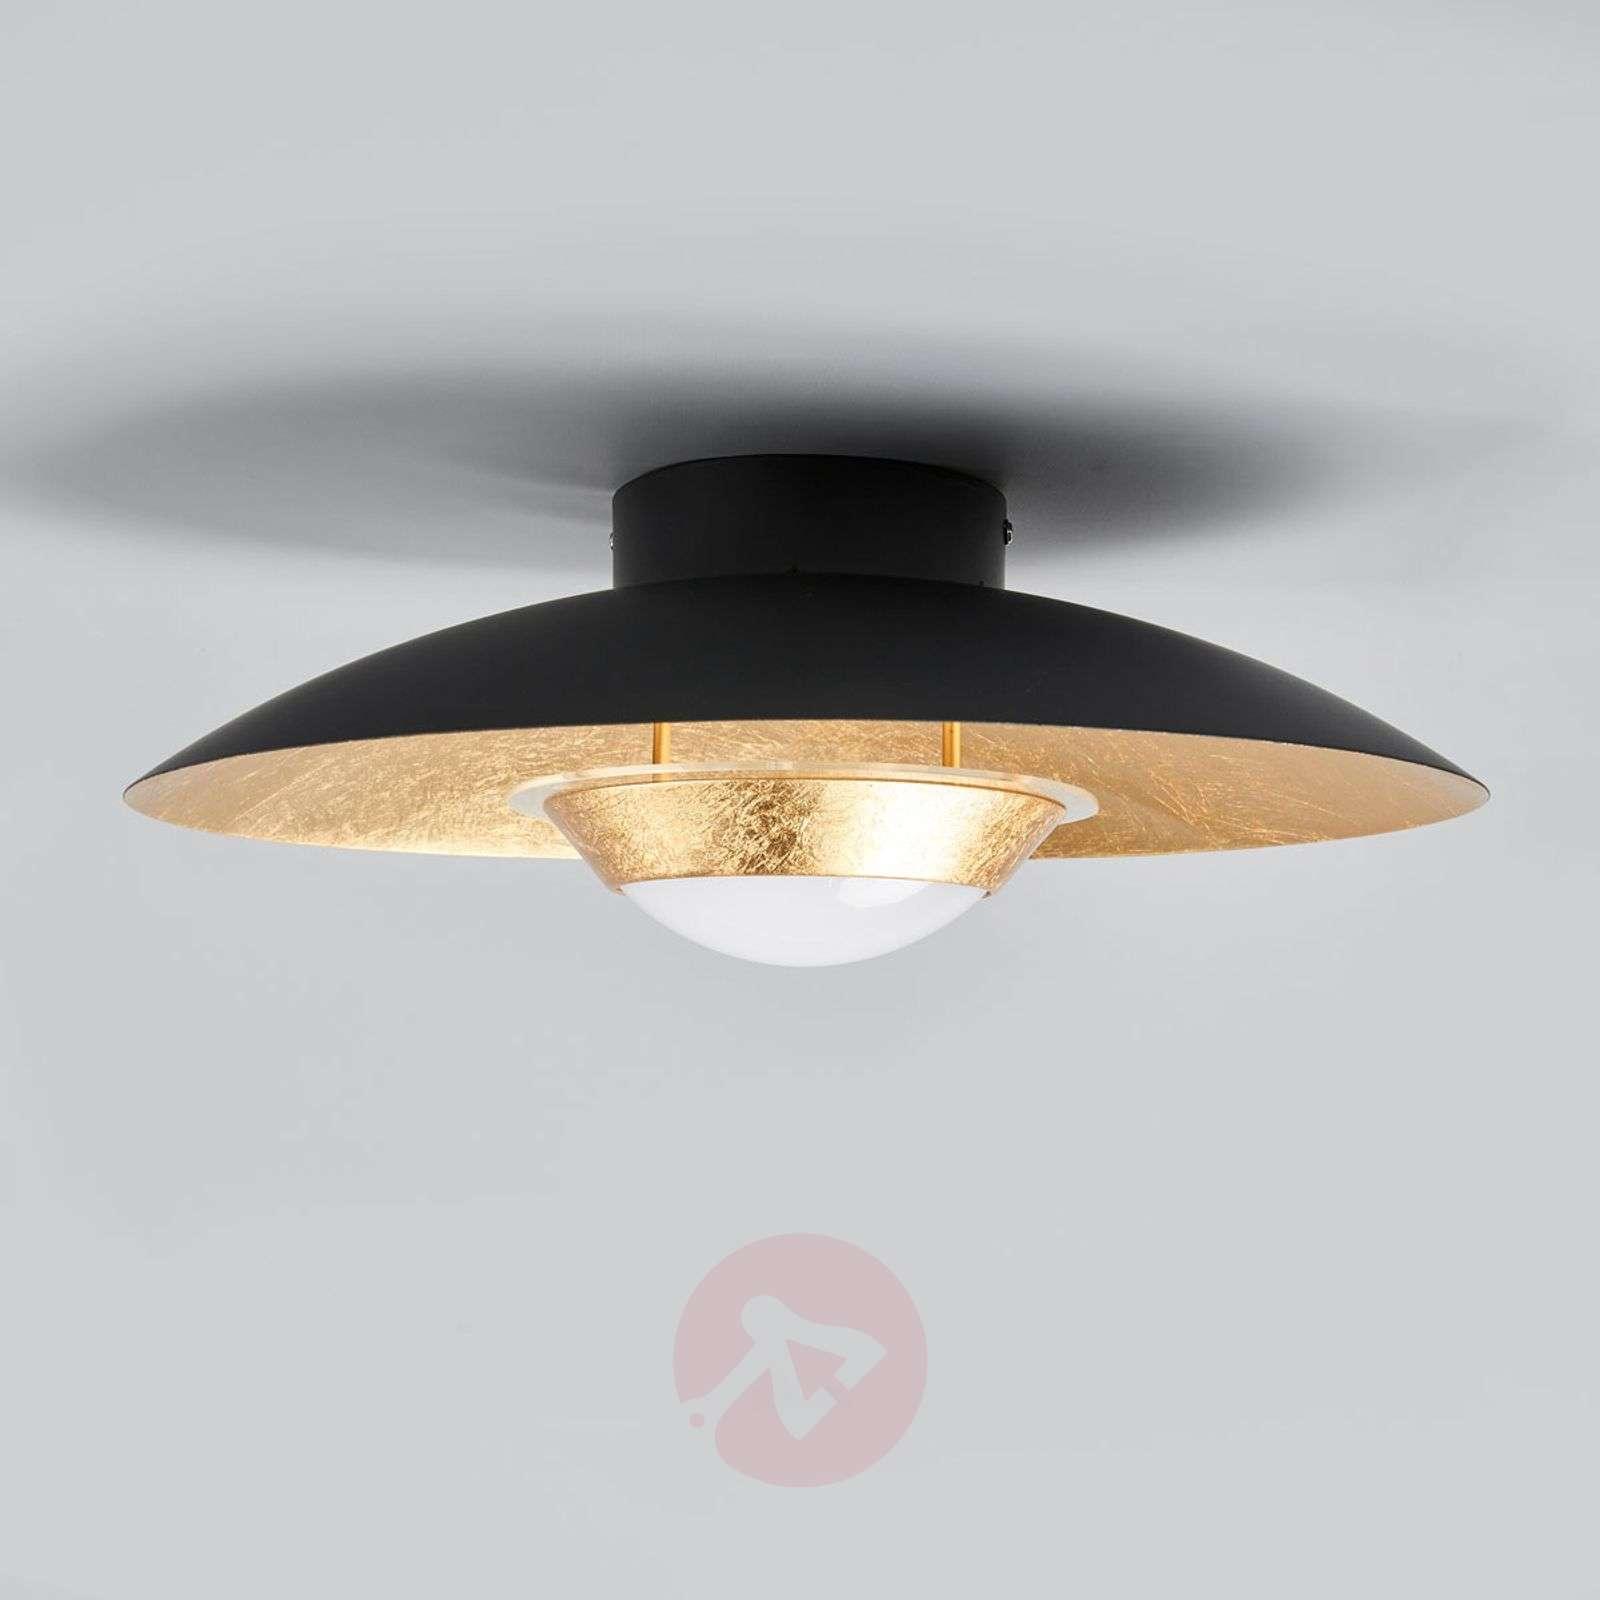 Black and gold LED ceiling light Yasien-9625137-03